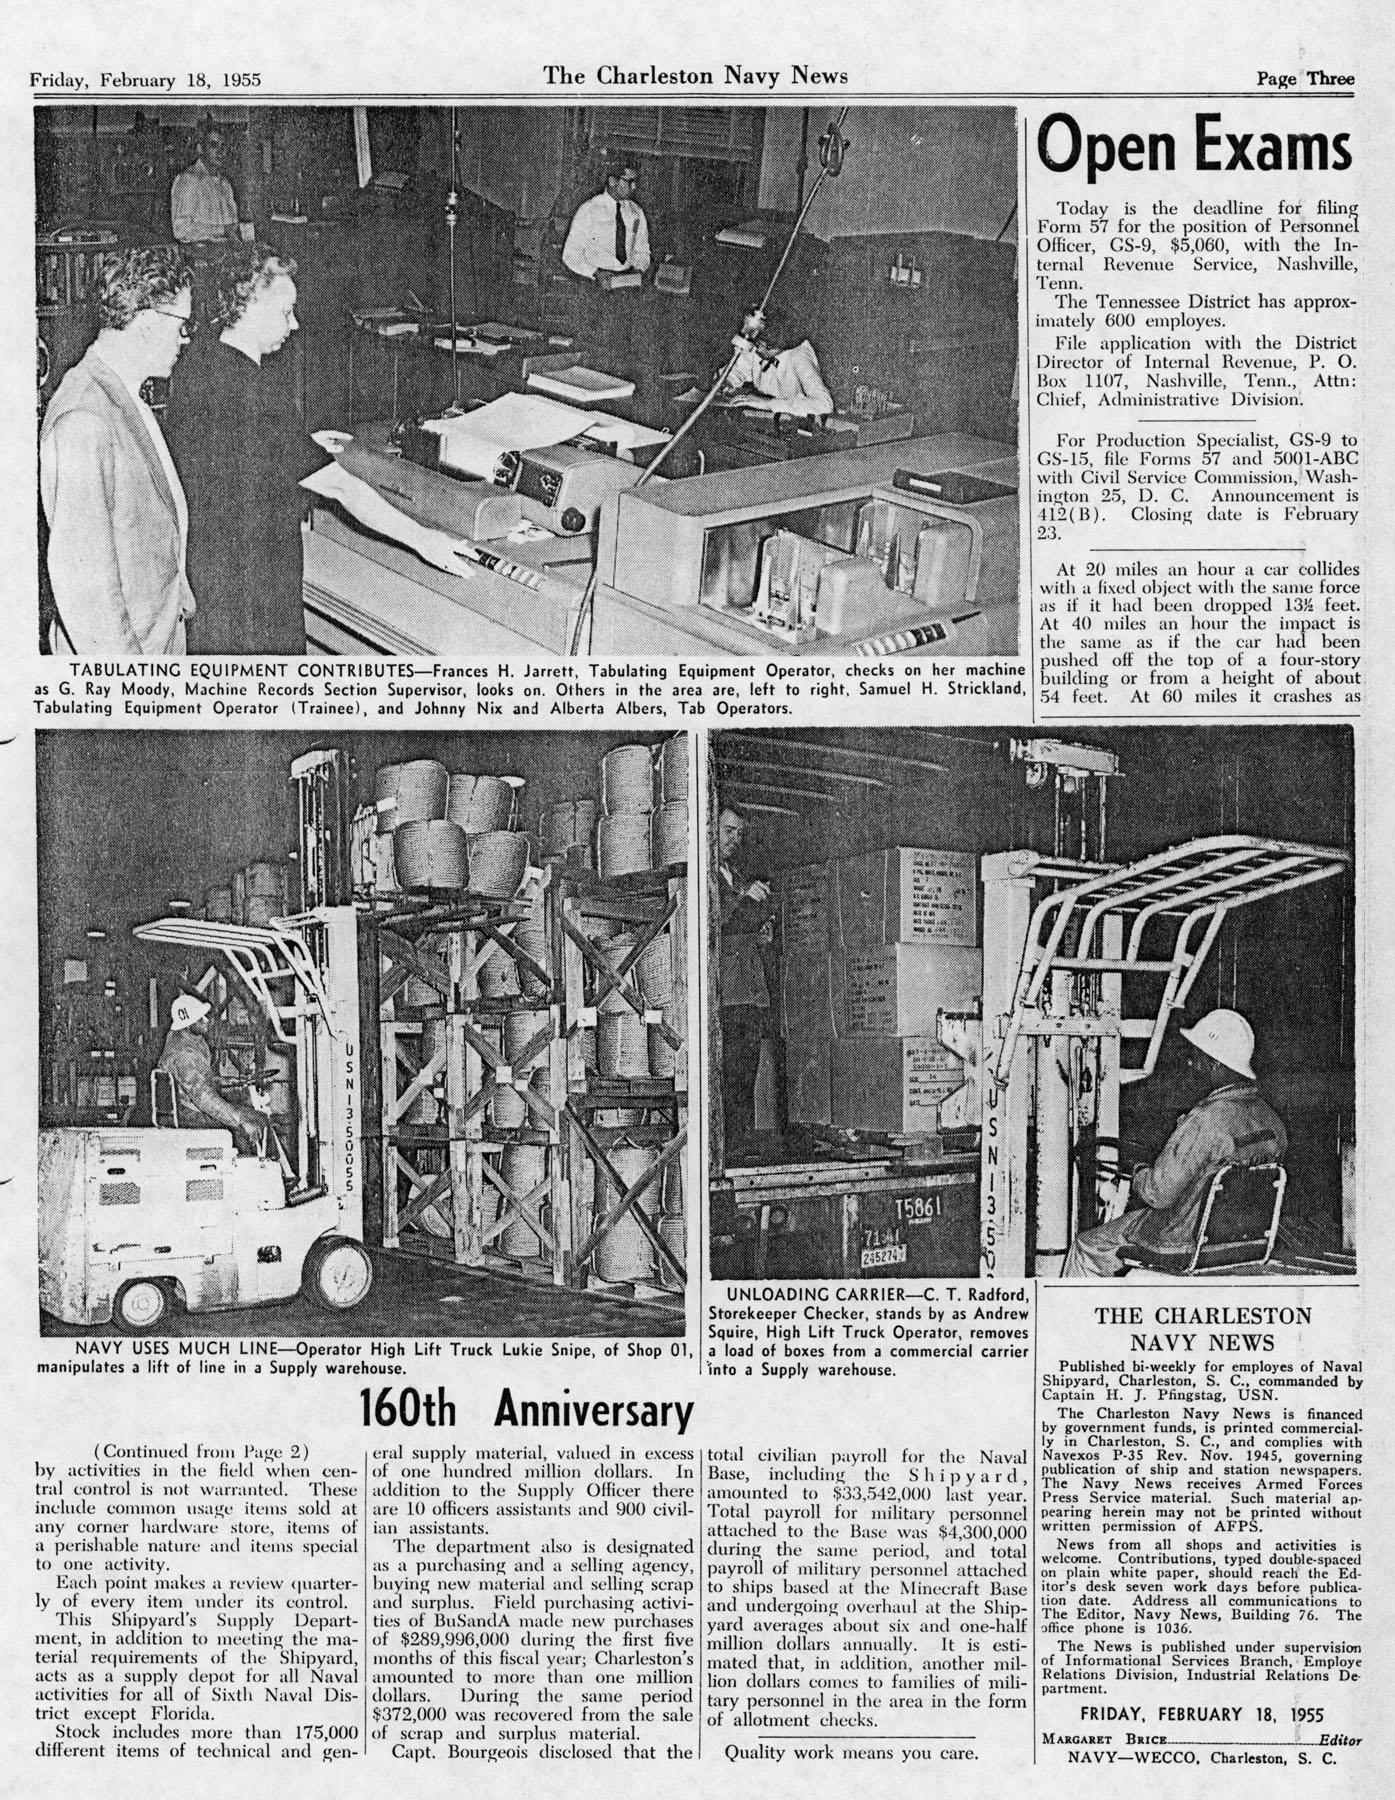 The Charleston Navy News, Volume 13, Edition 16, page iii